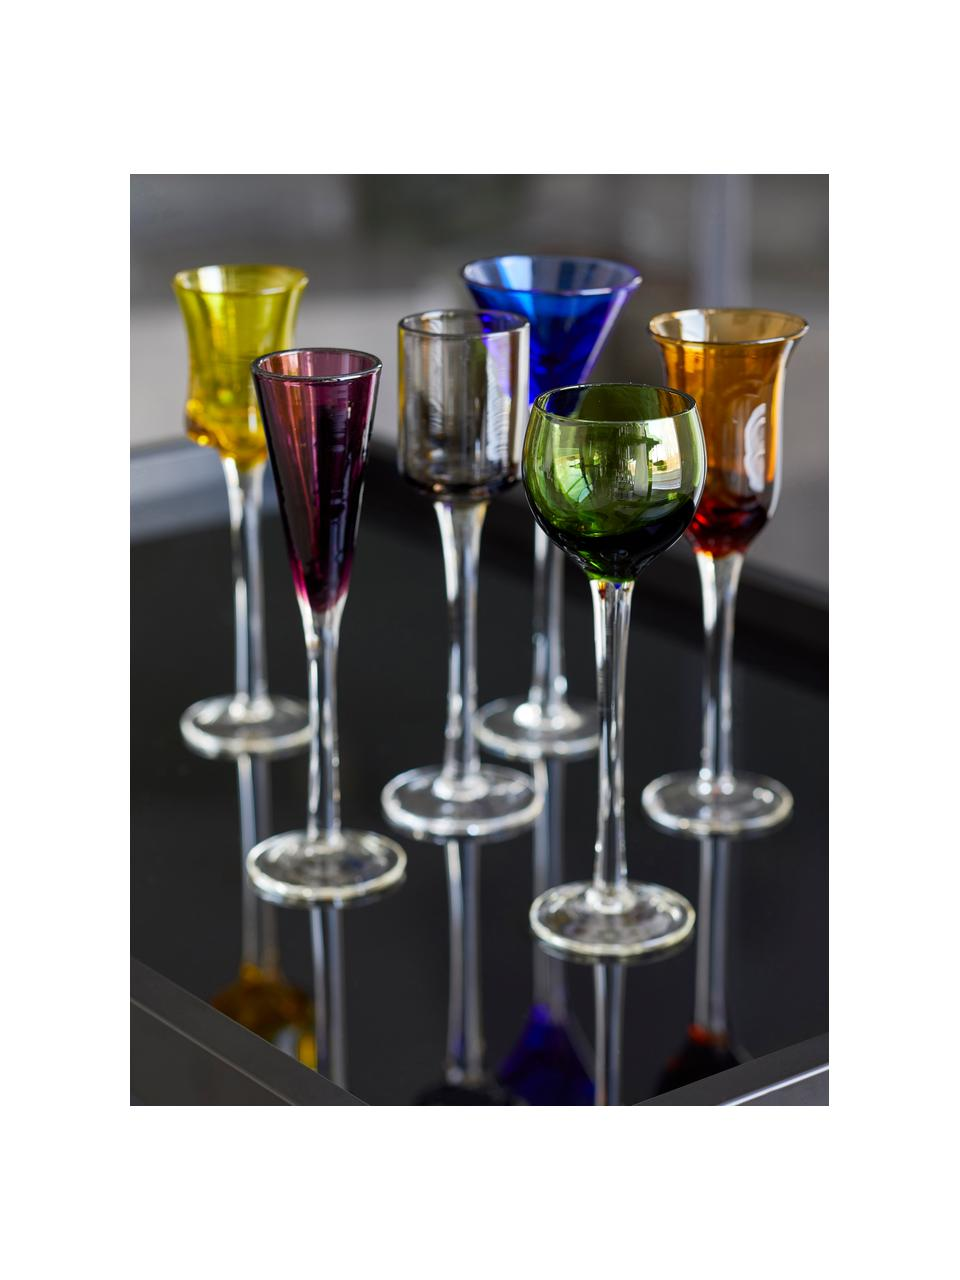 Mondgeblazen borrelglazen Lyngby in kleur, 6-delig, Glas, Groen, blauw, bruin, geel, lila, oranje, Ø 5 x H 16 cm